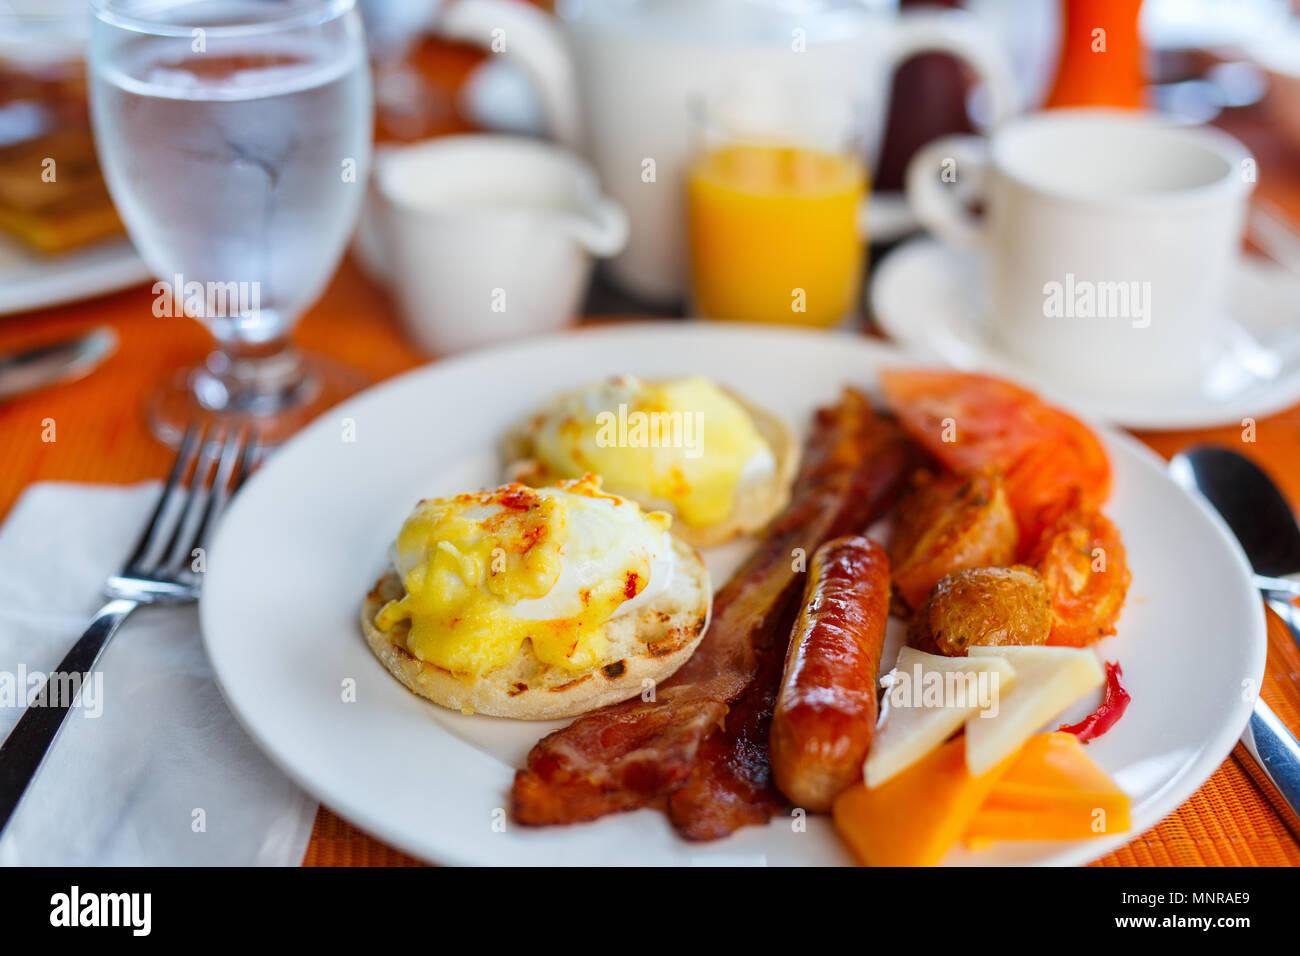 Delicious breakfast with eggs Benedict,  bacon,  orange juice and coffee - Stock Image